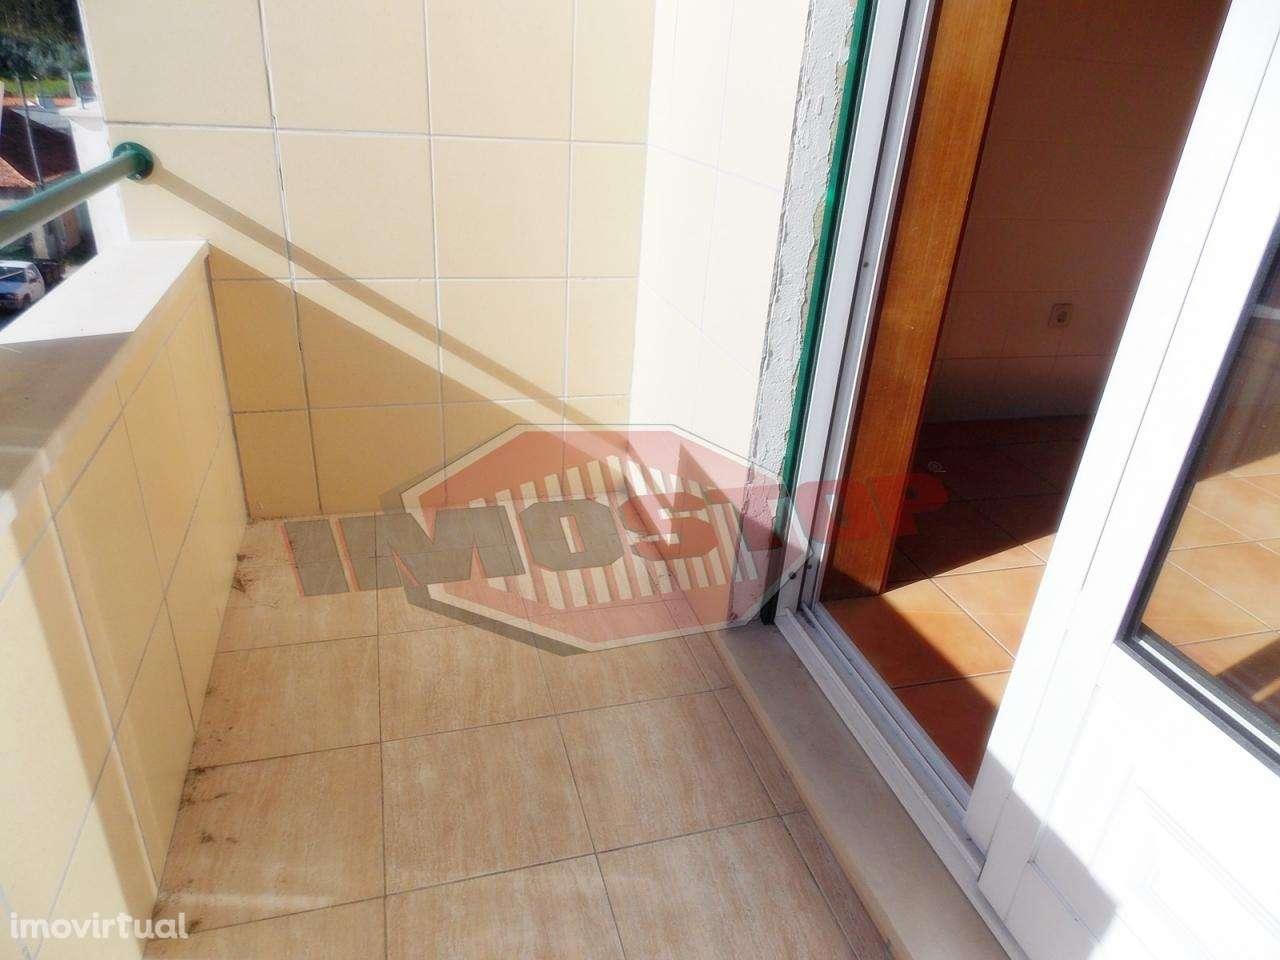 Apartamento para comprar, Oiã, Oliveira do Bairro, Aveiro - Foto 7